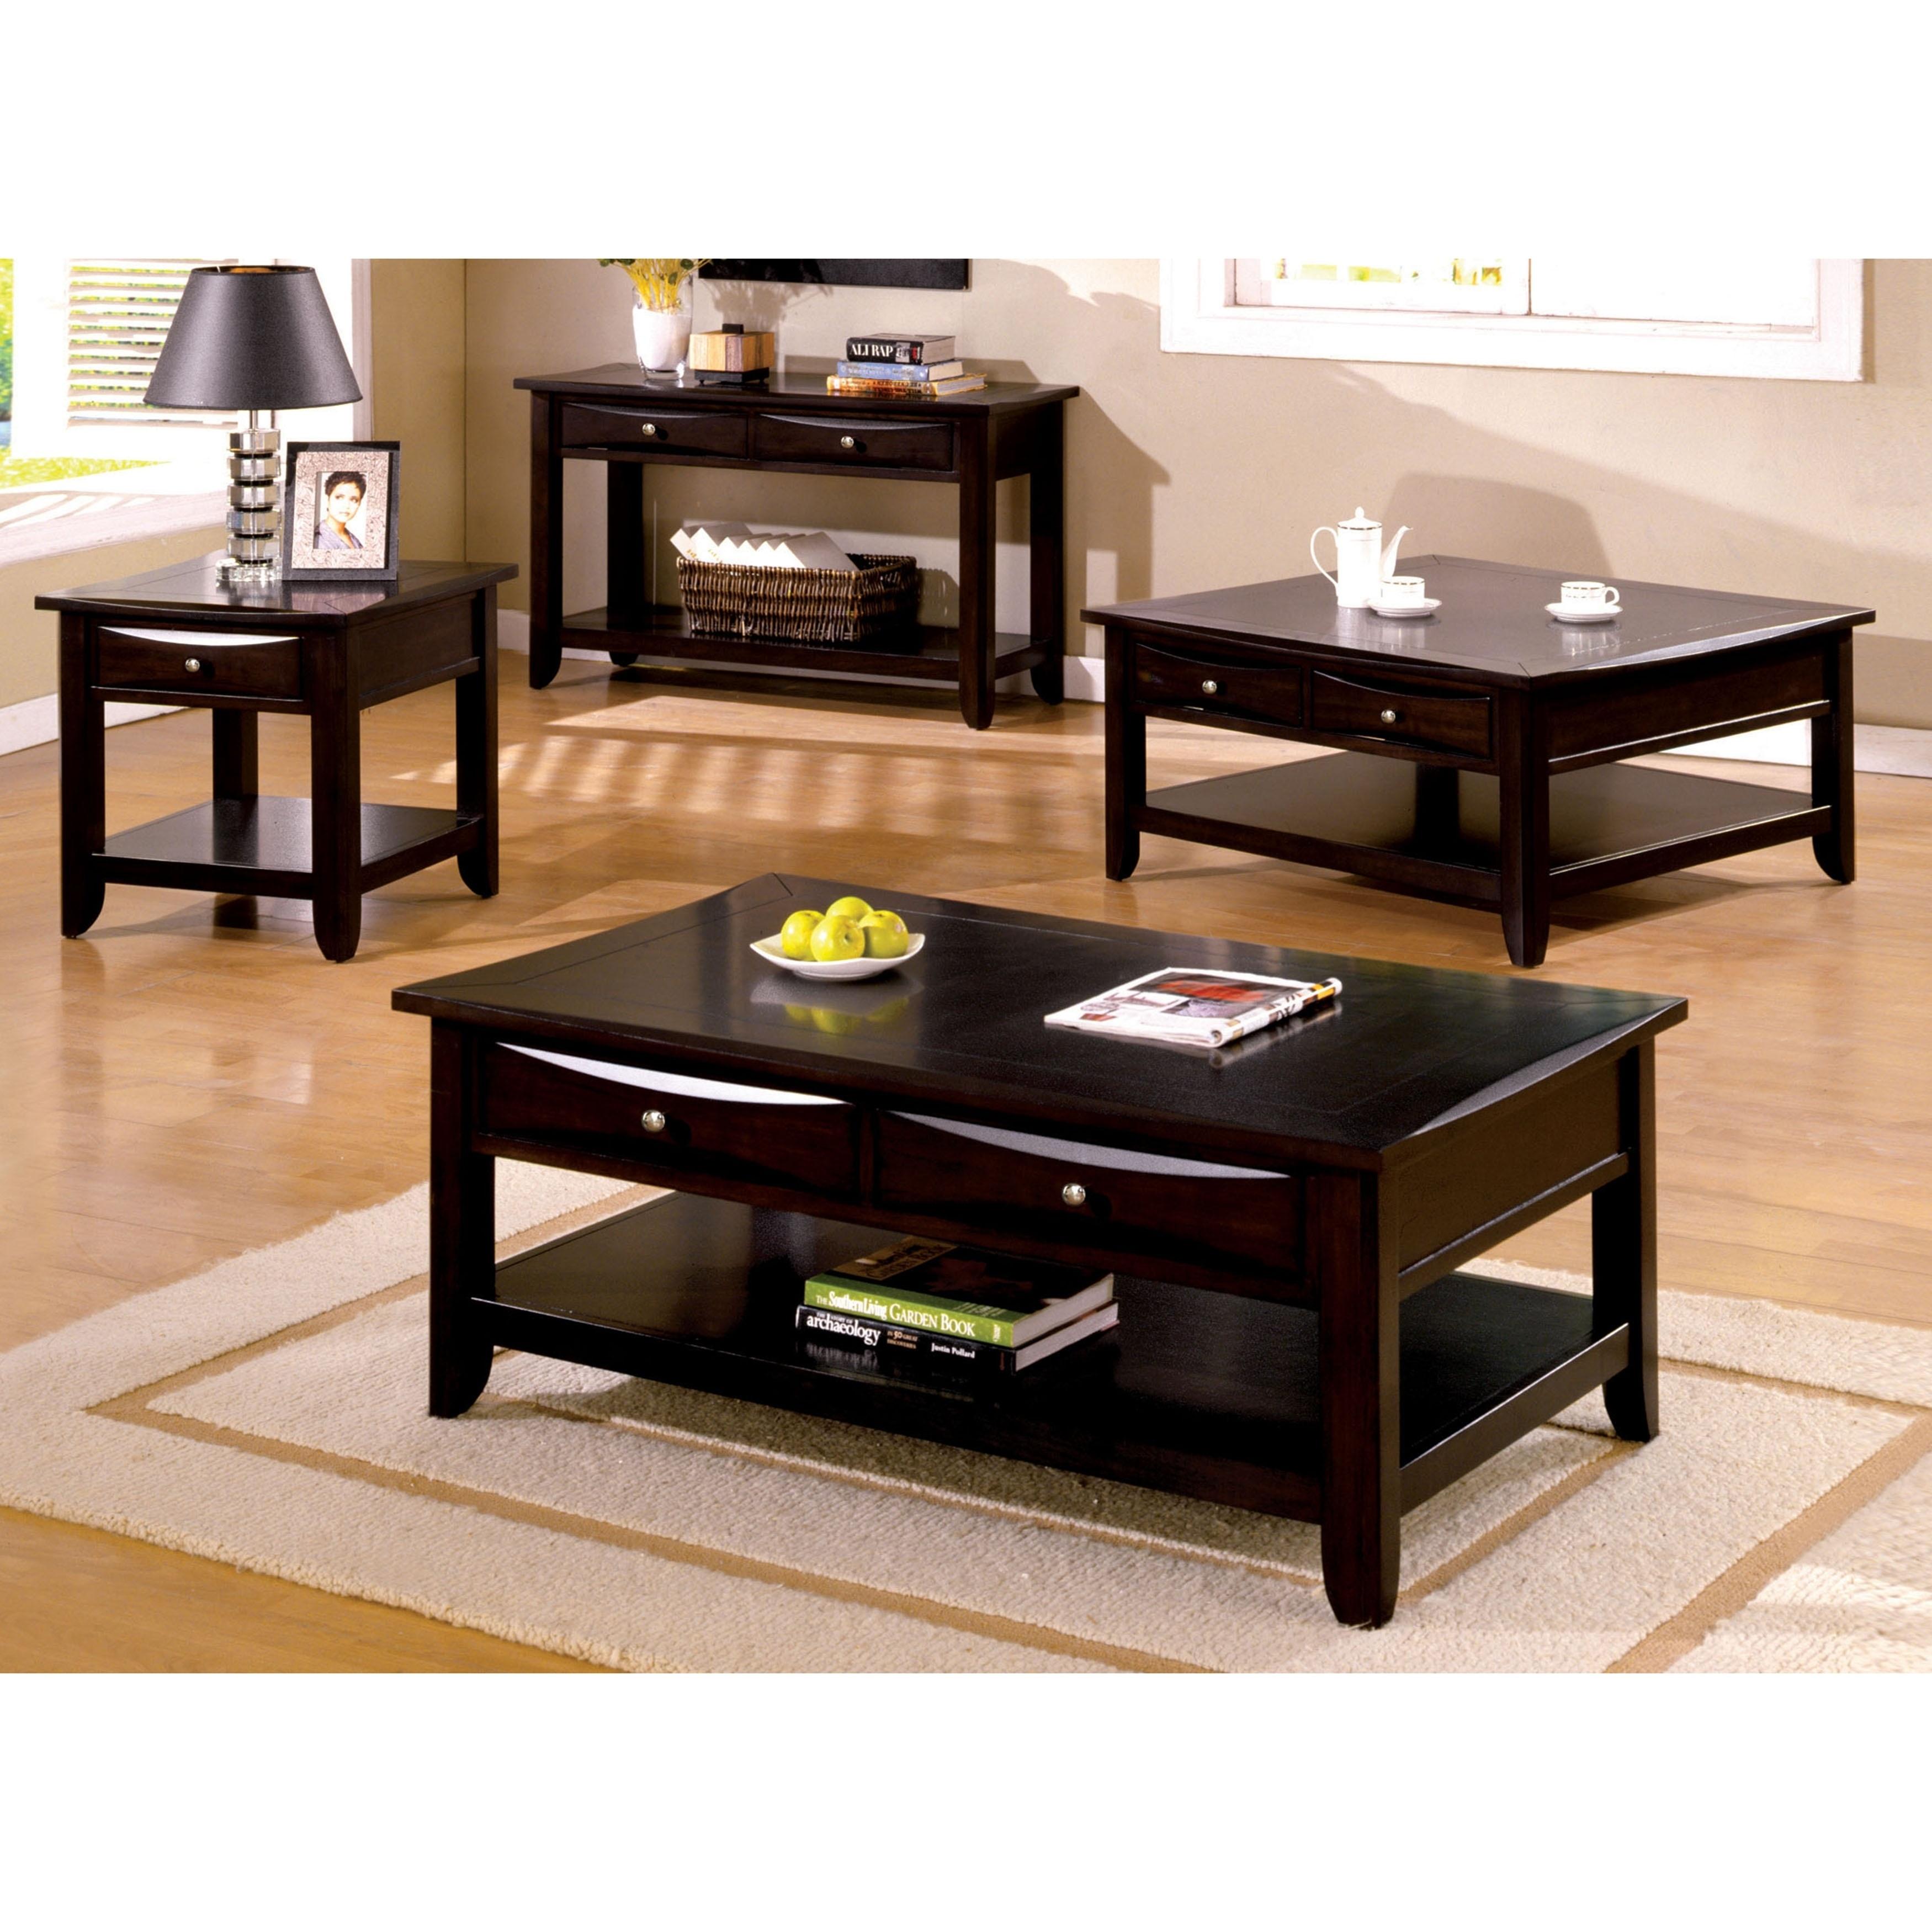 Excellent Furniture Of America Buldgewin Espresso 2 Drawer Sofa Table Ibusinesslaw Wood Chair Design Ideas Ibusinesslaworg